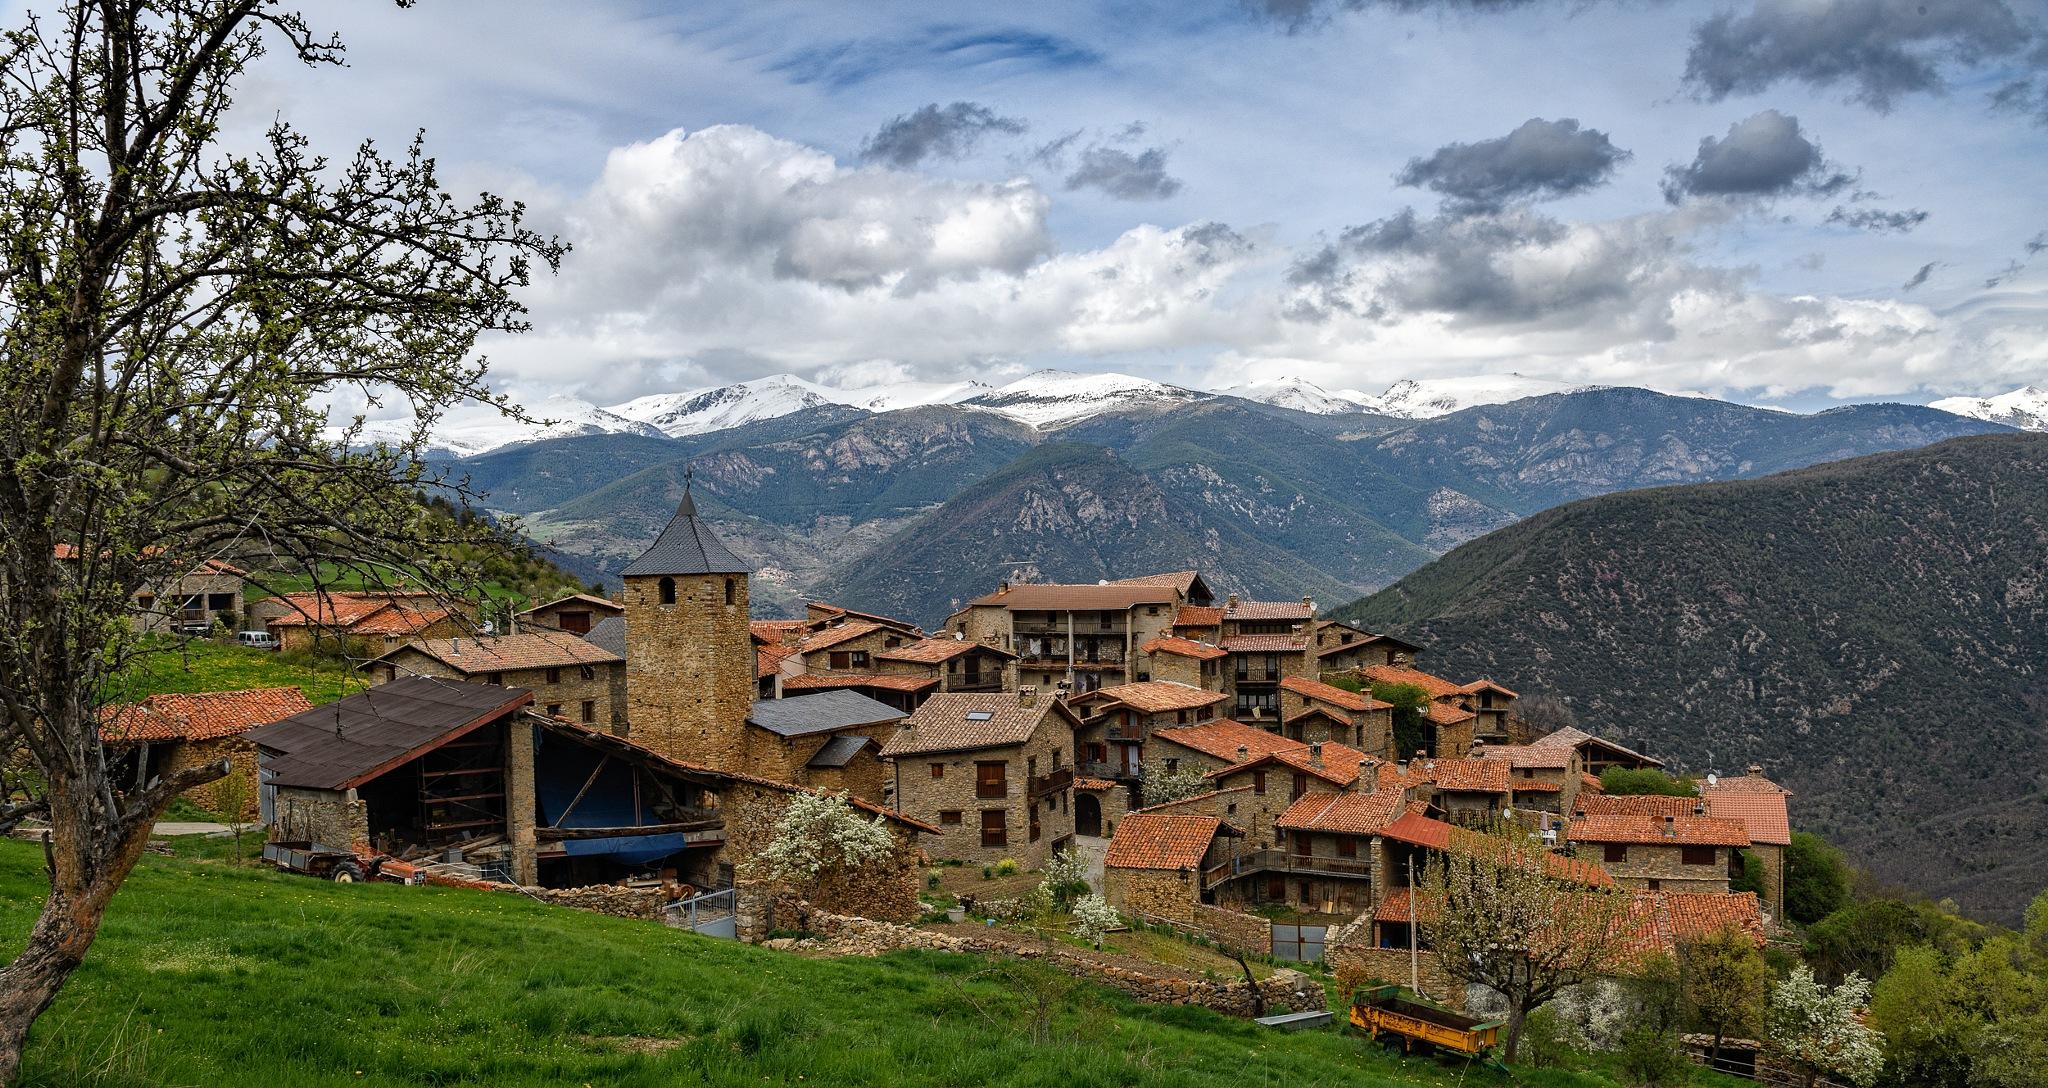 Ansovell, Spain #2 by Steve Director